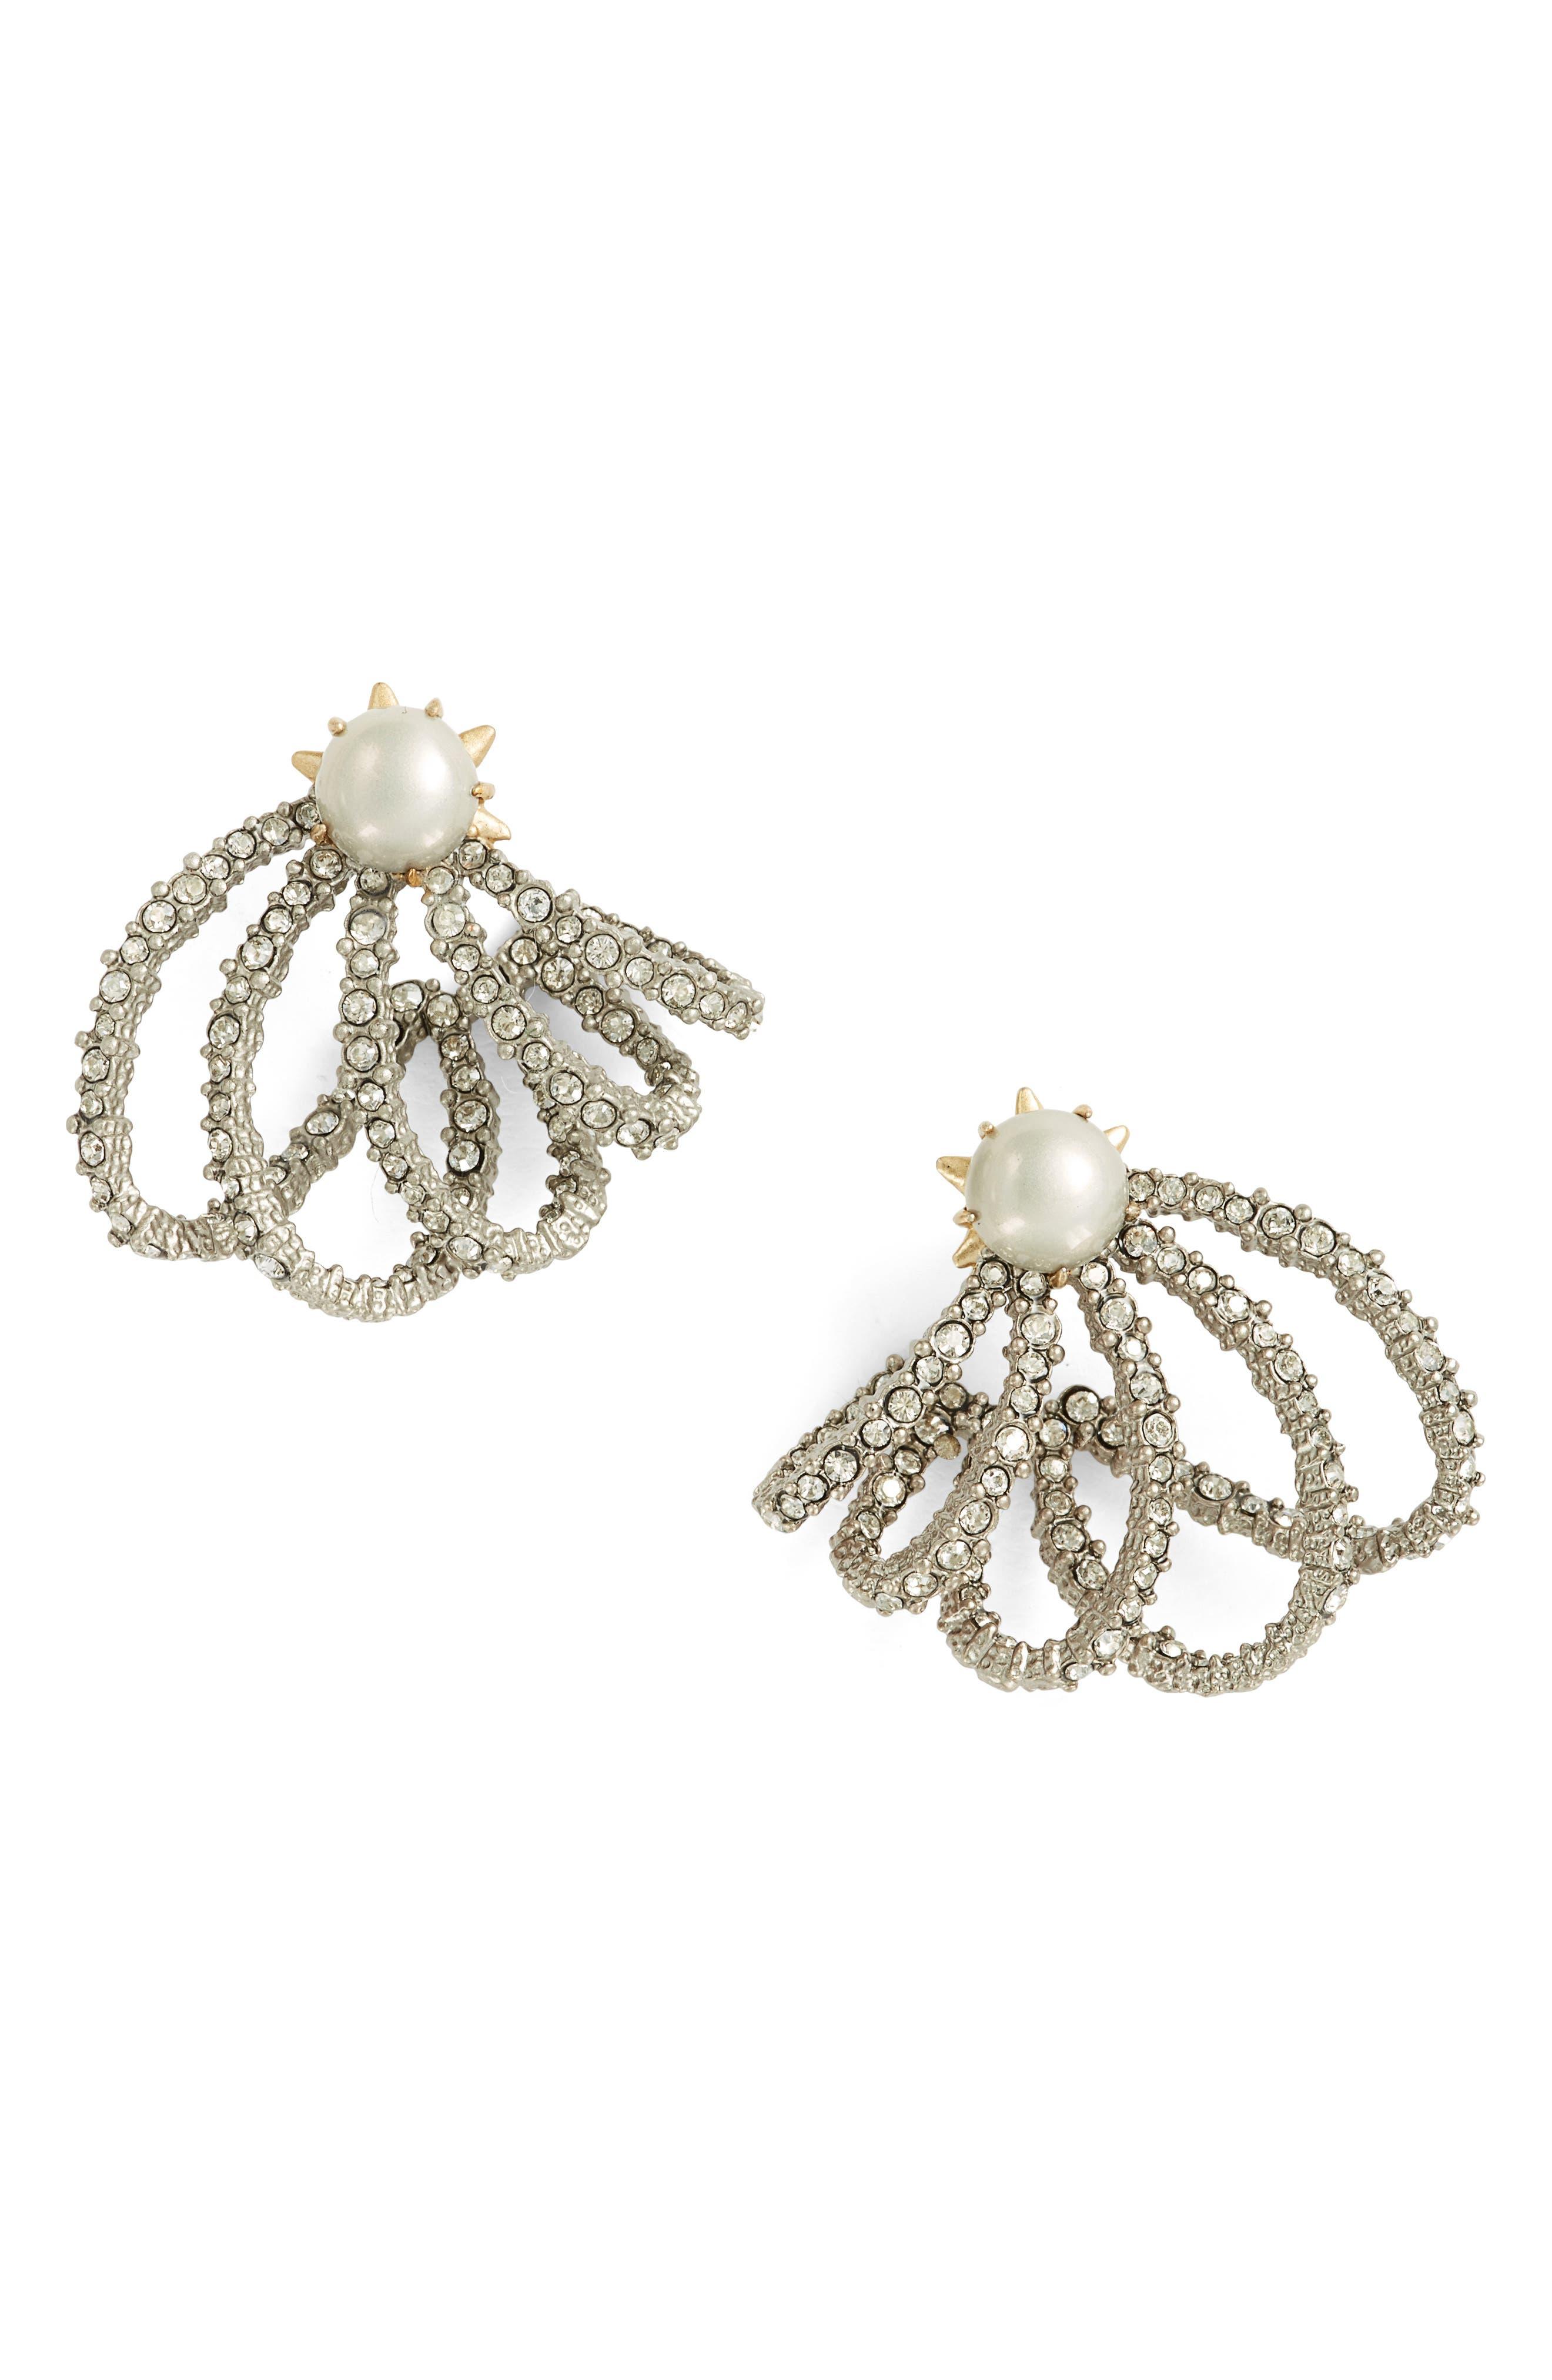 Main Image - Alexis Bittar Orbiting Crystal Earrings